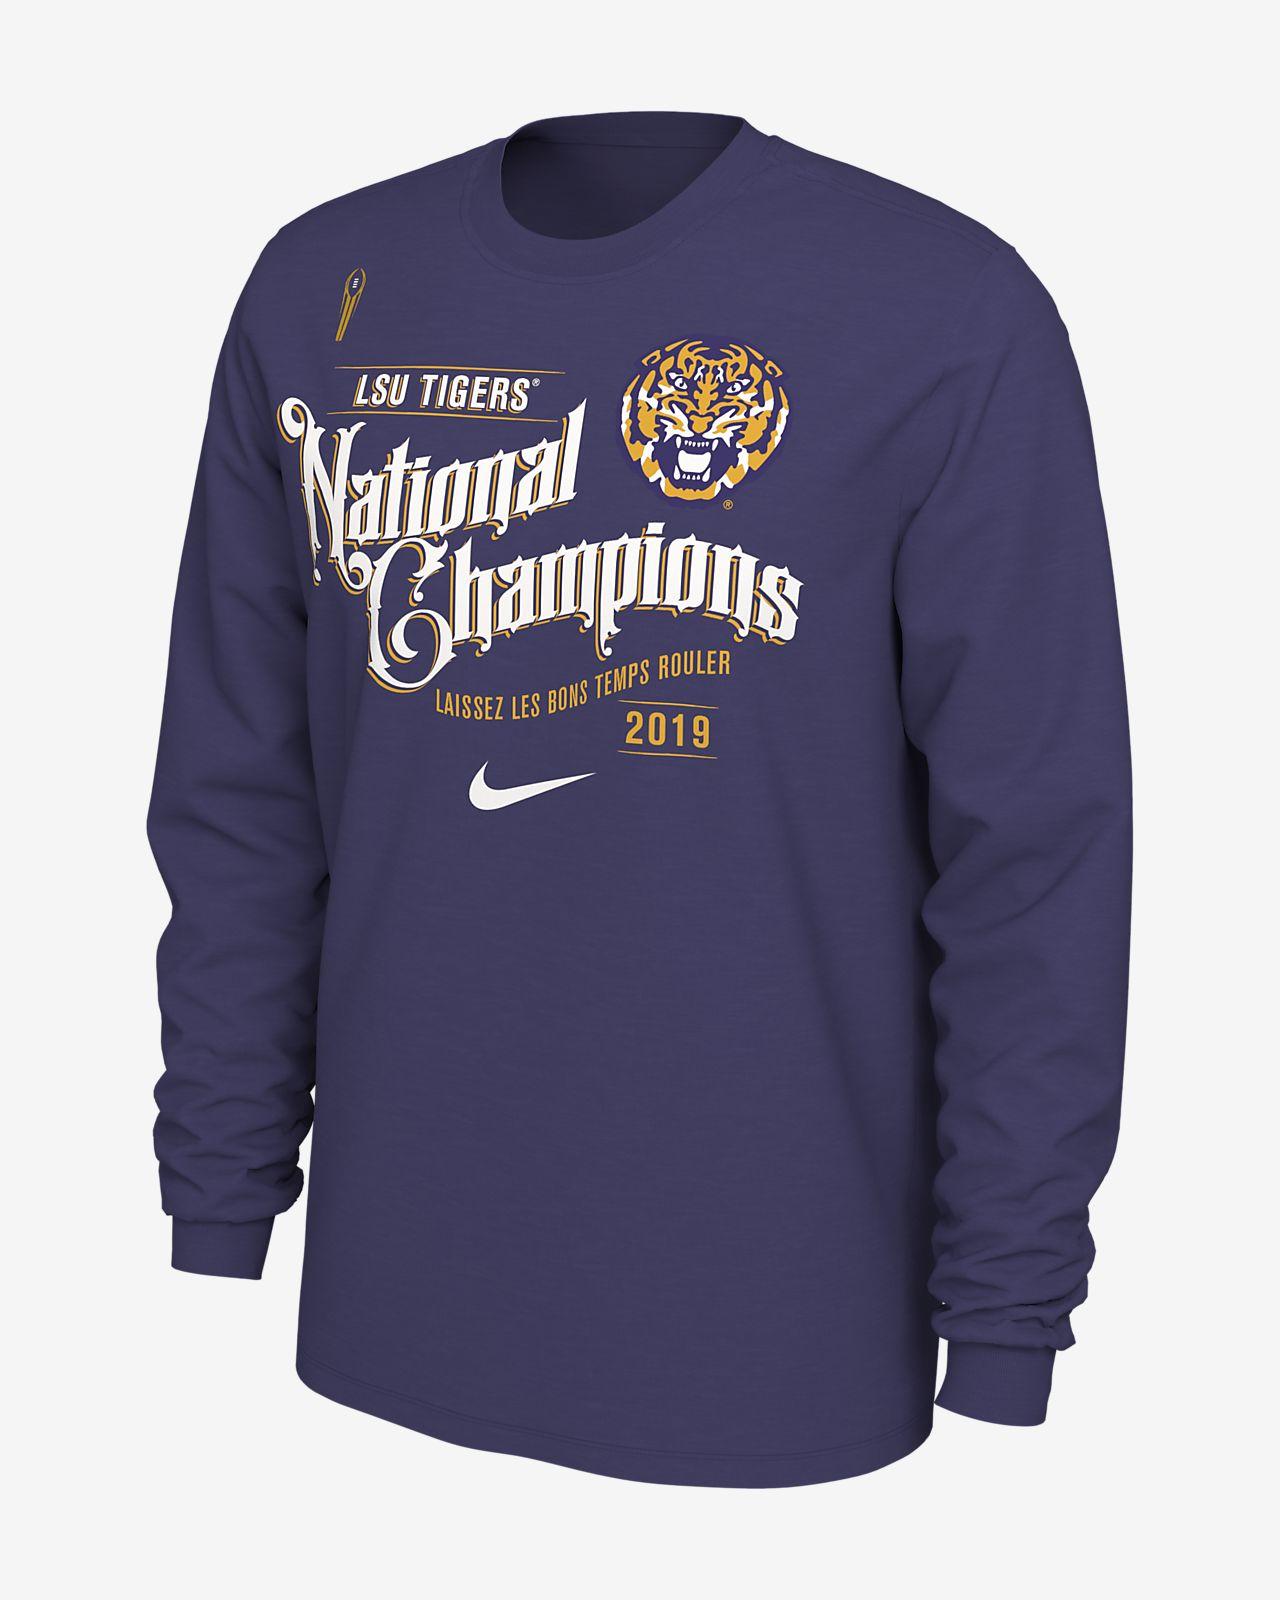 Nike College National Championship Game Celebration (LSU) Men's Long-Sleeve T-Shirt